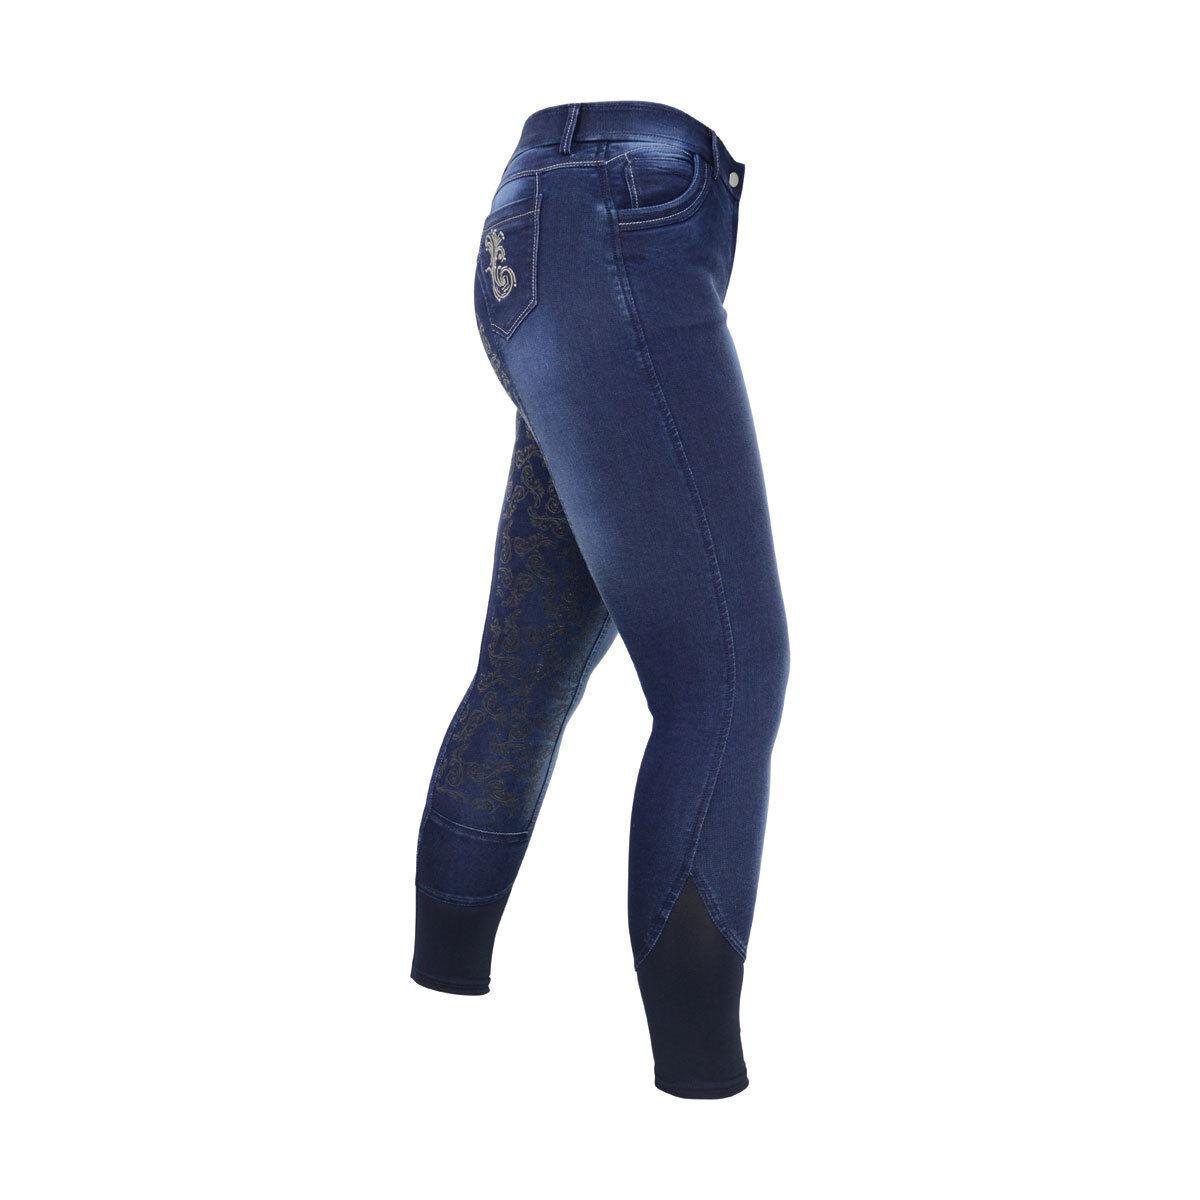 HyPerformance Cheltenham Ladies Pantaloni in Denim Lavato